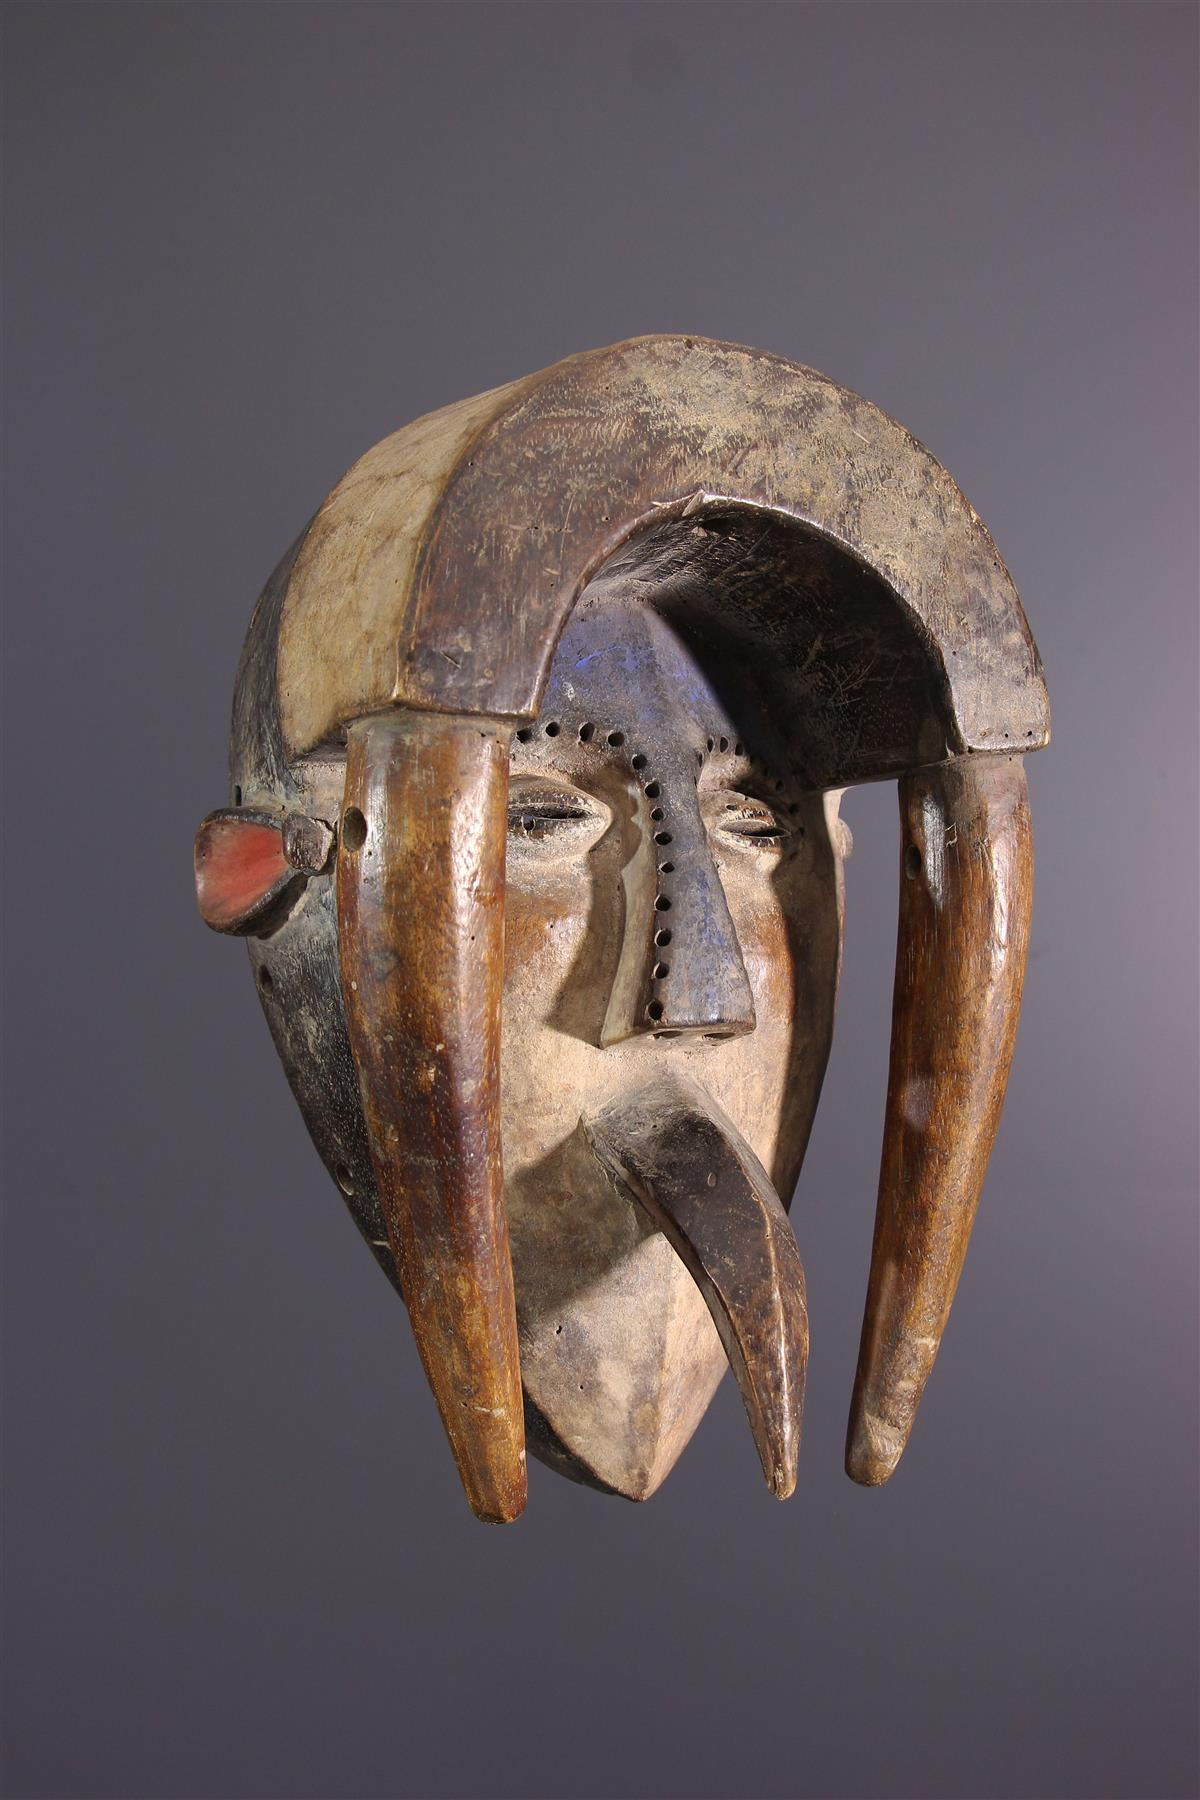 Ligbi mask - Tribal art